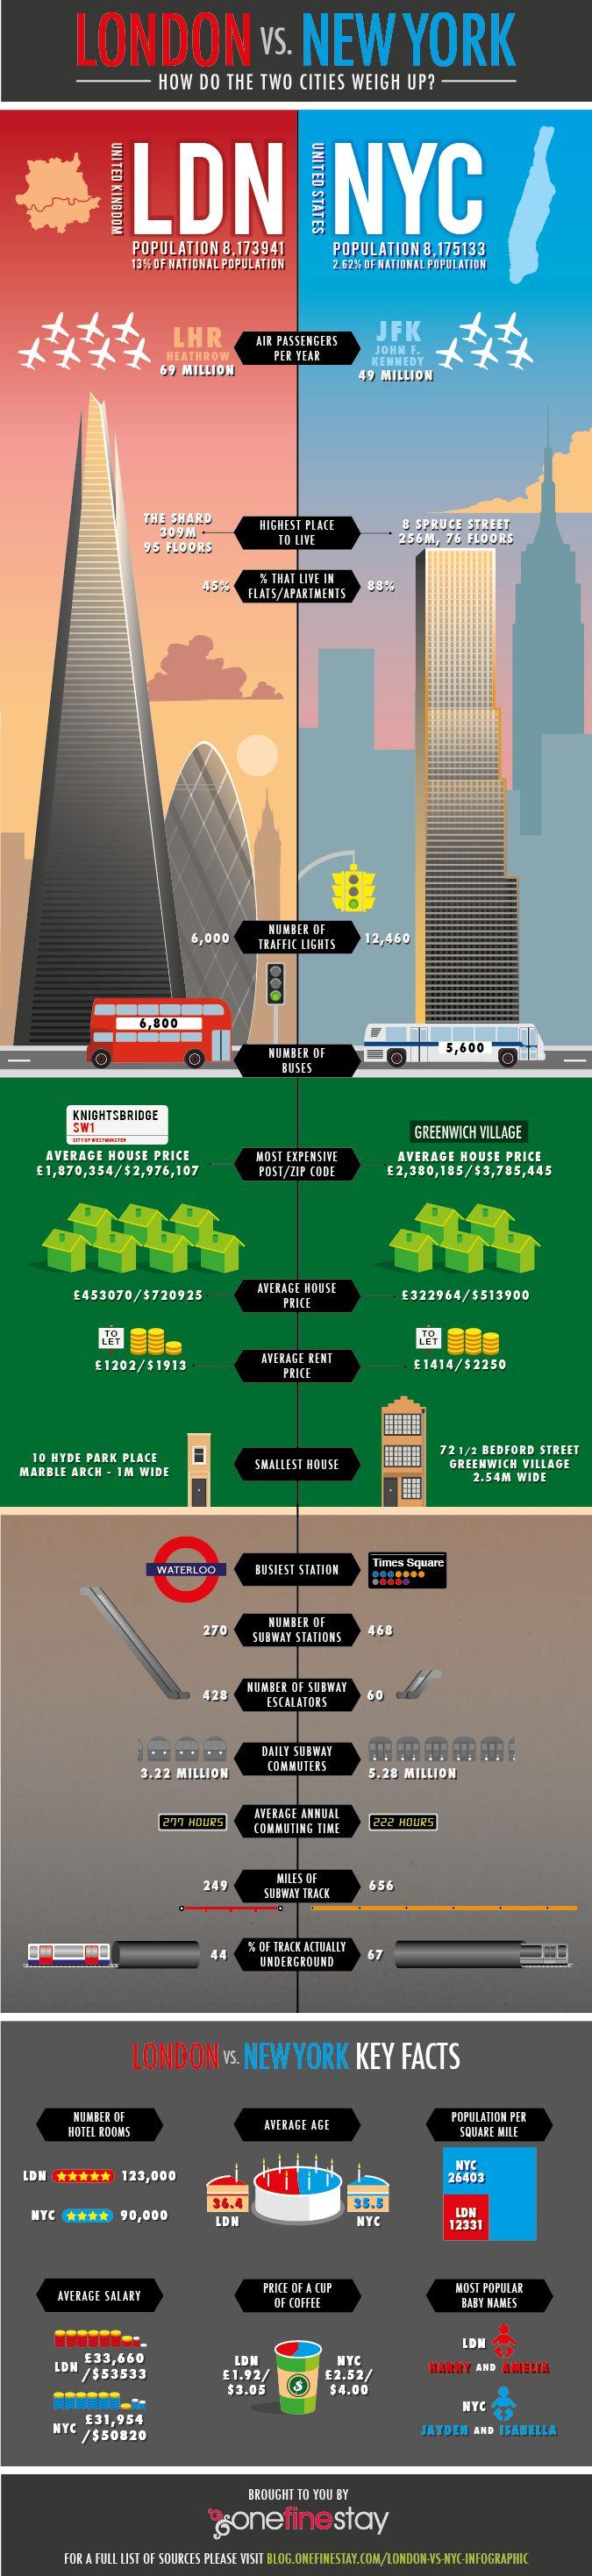 London vs. New York infographic